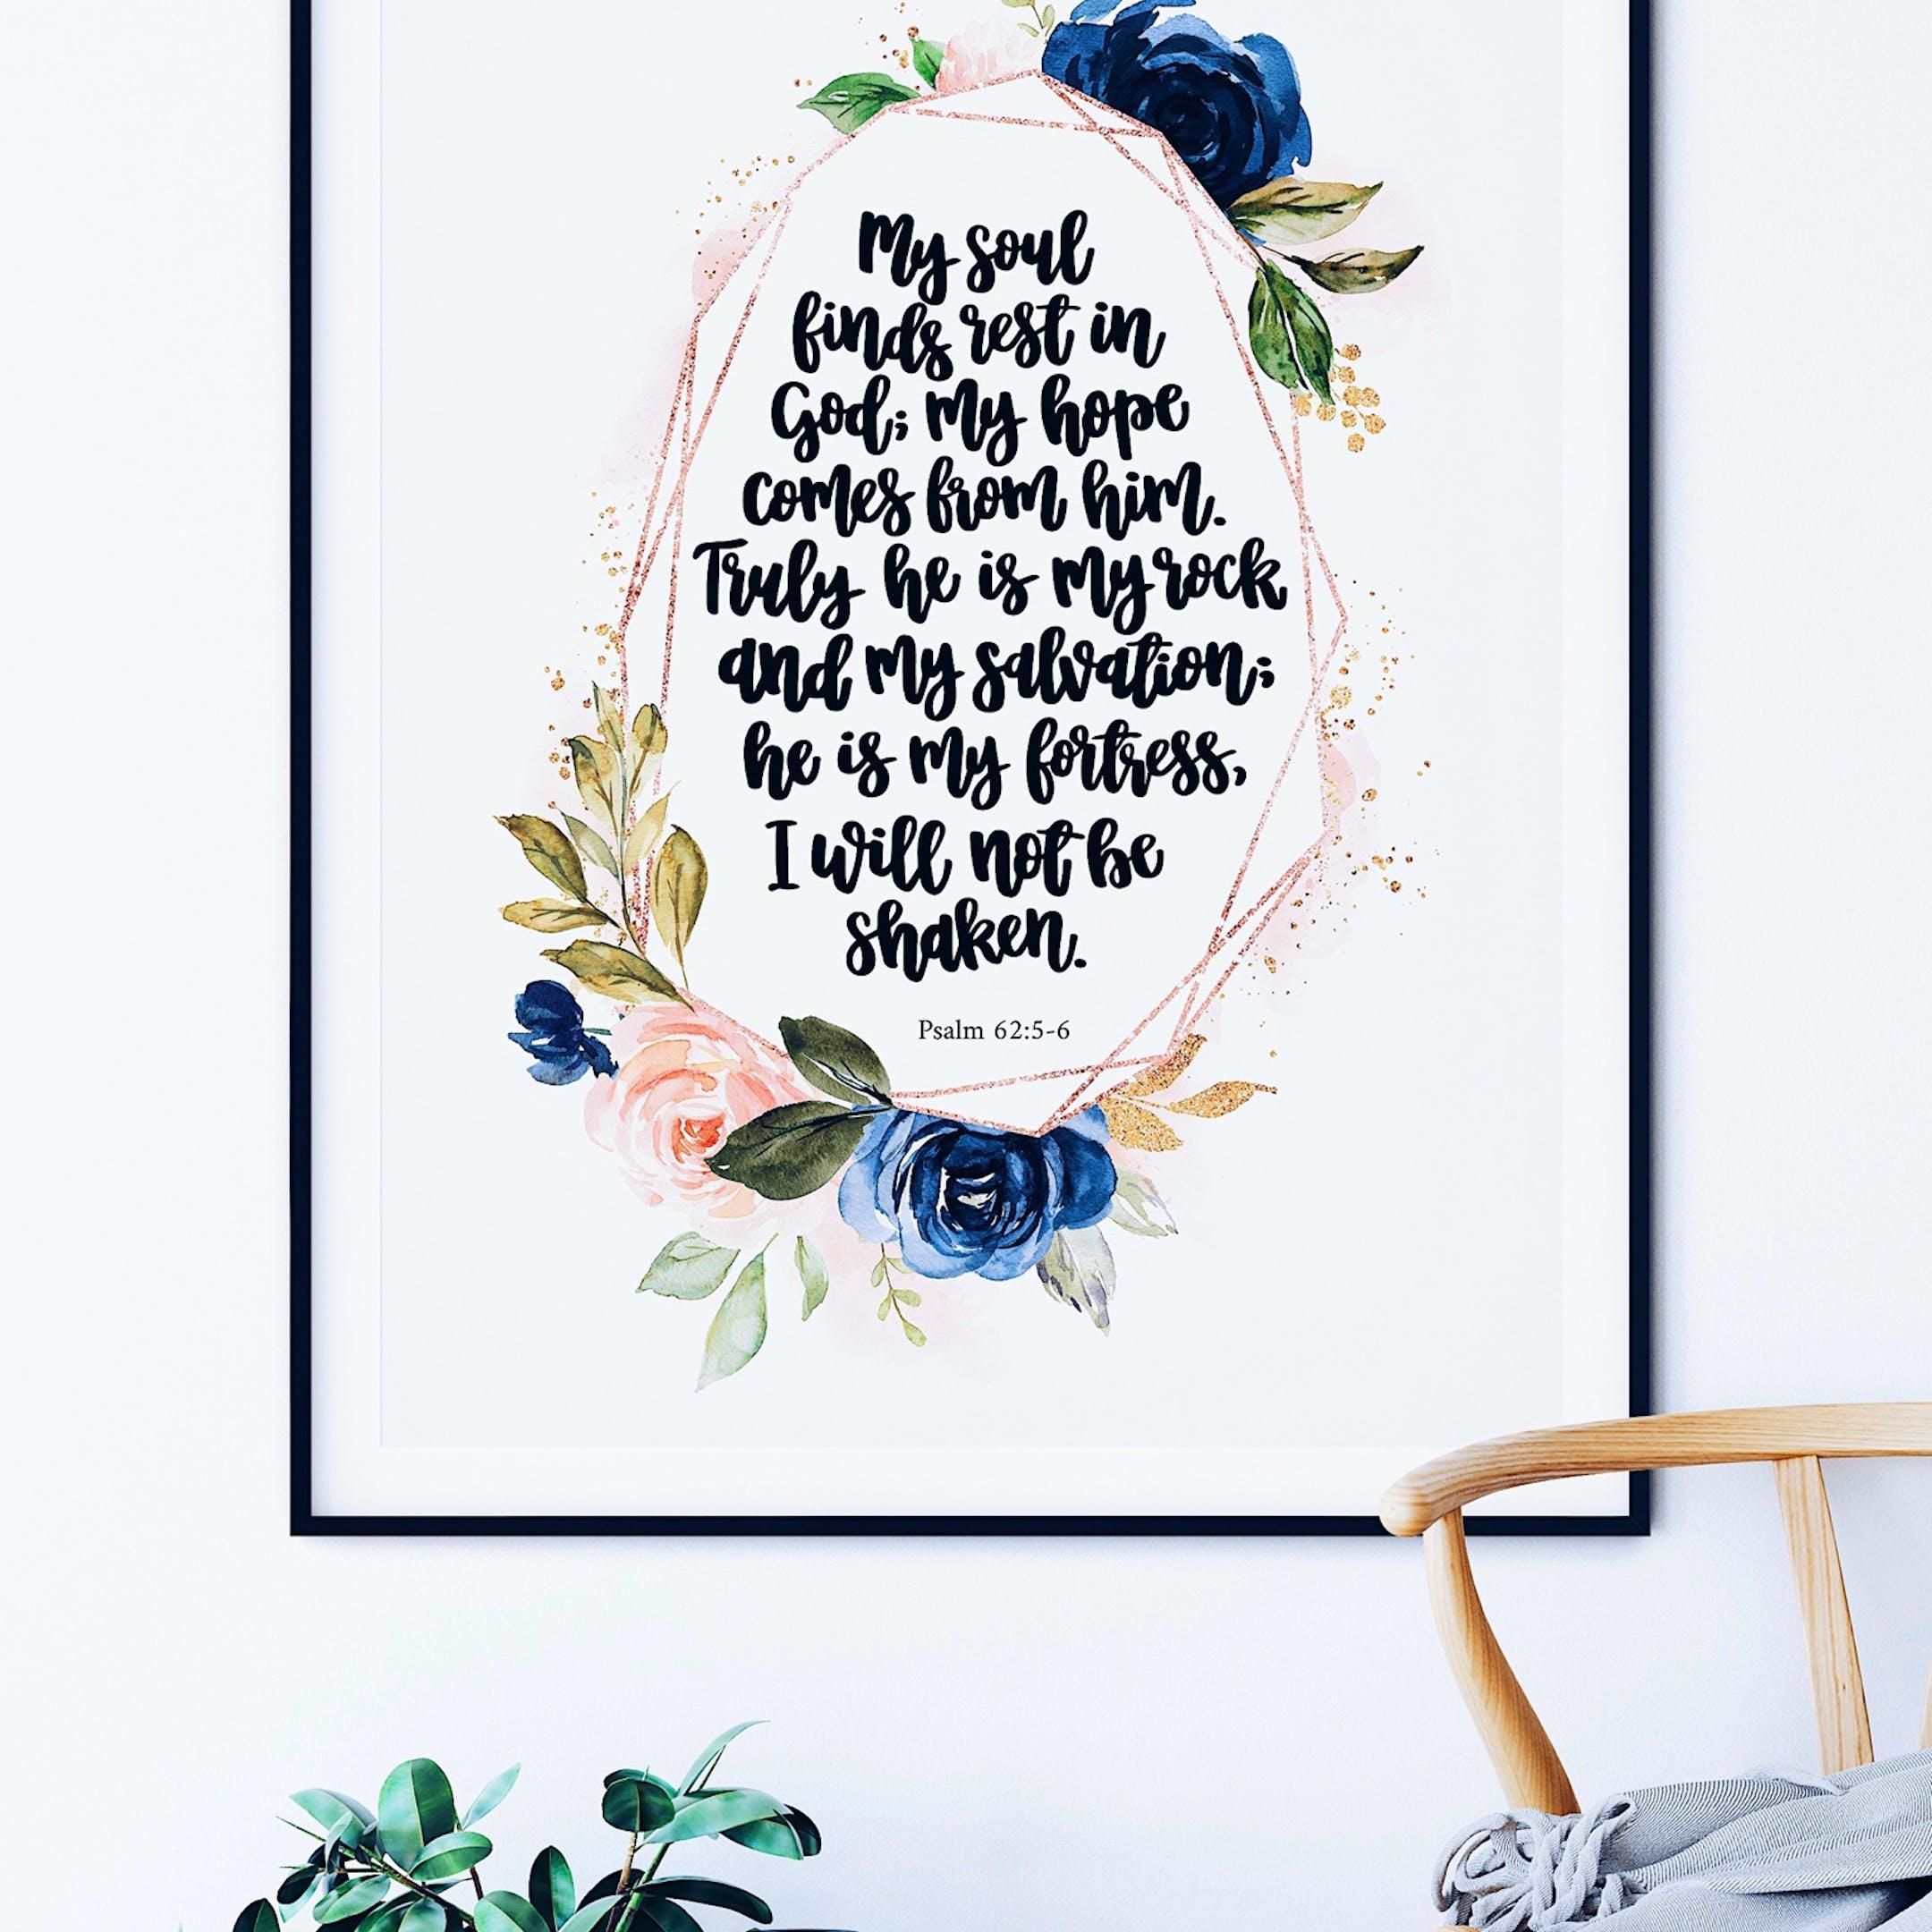 Psalm 62:5-6 Rose Gold Print - Izzy & Pop